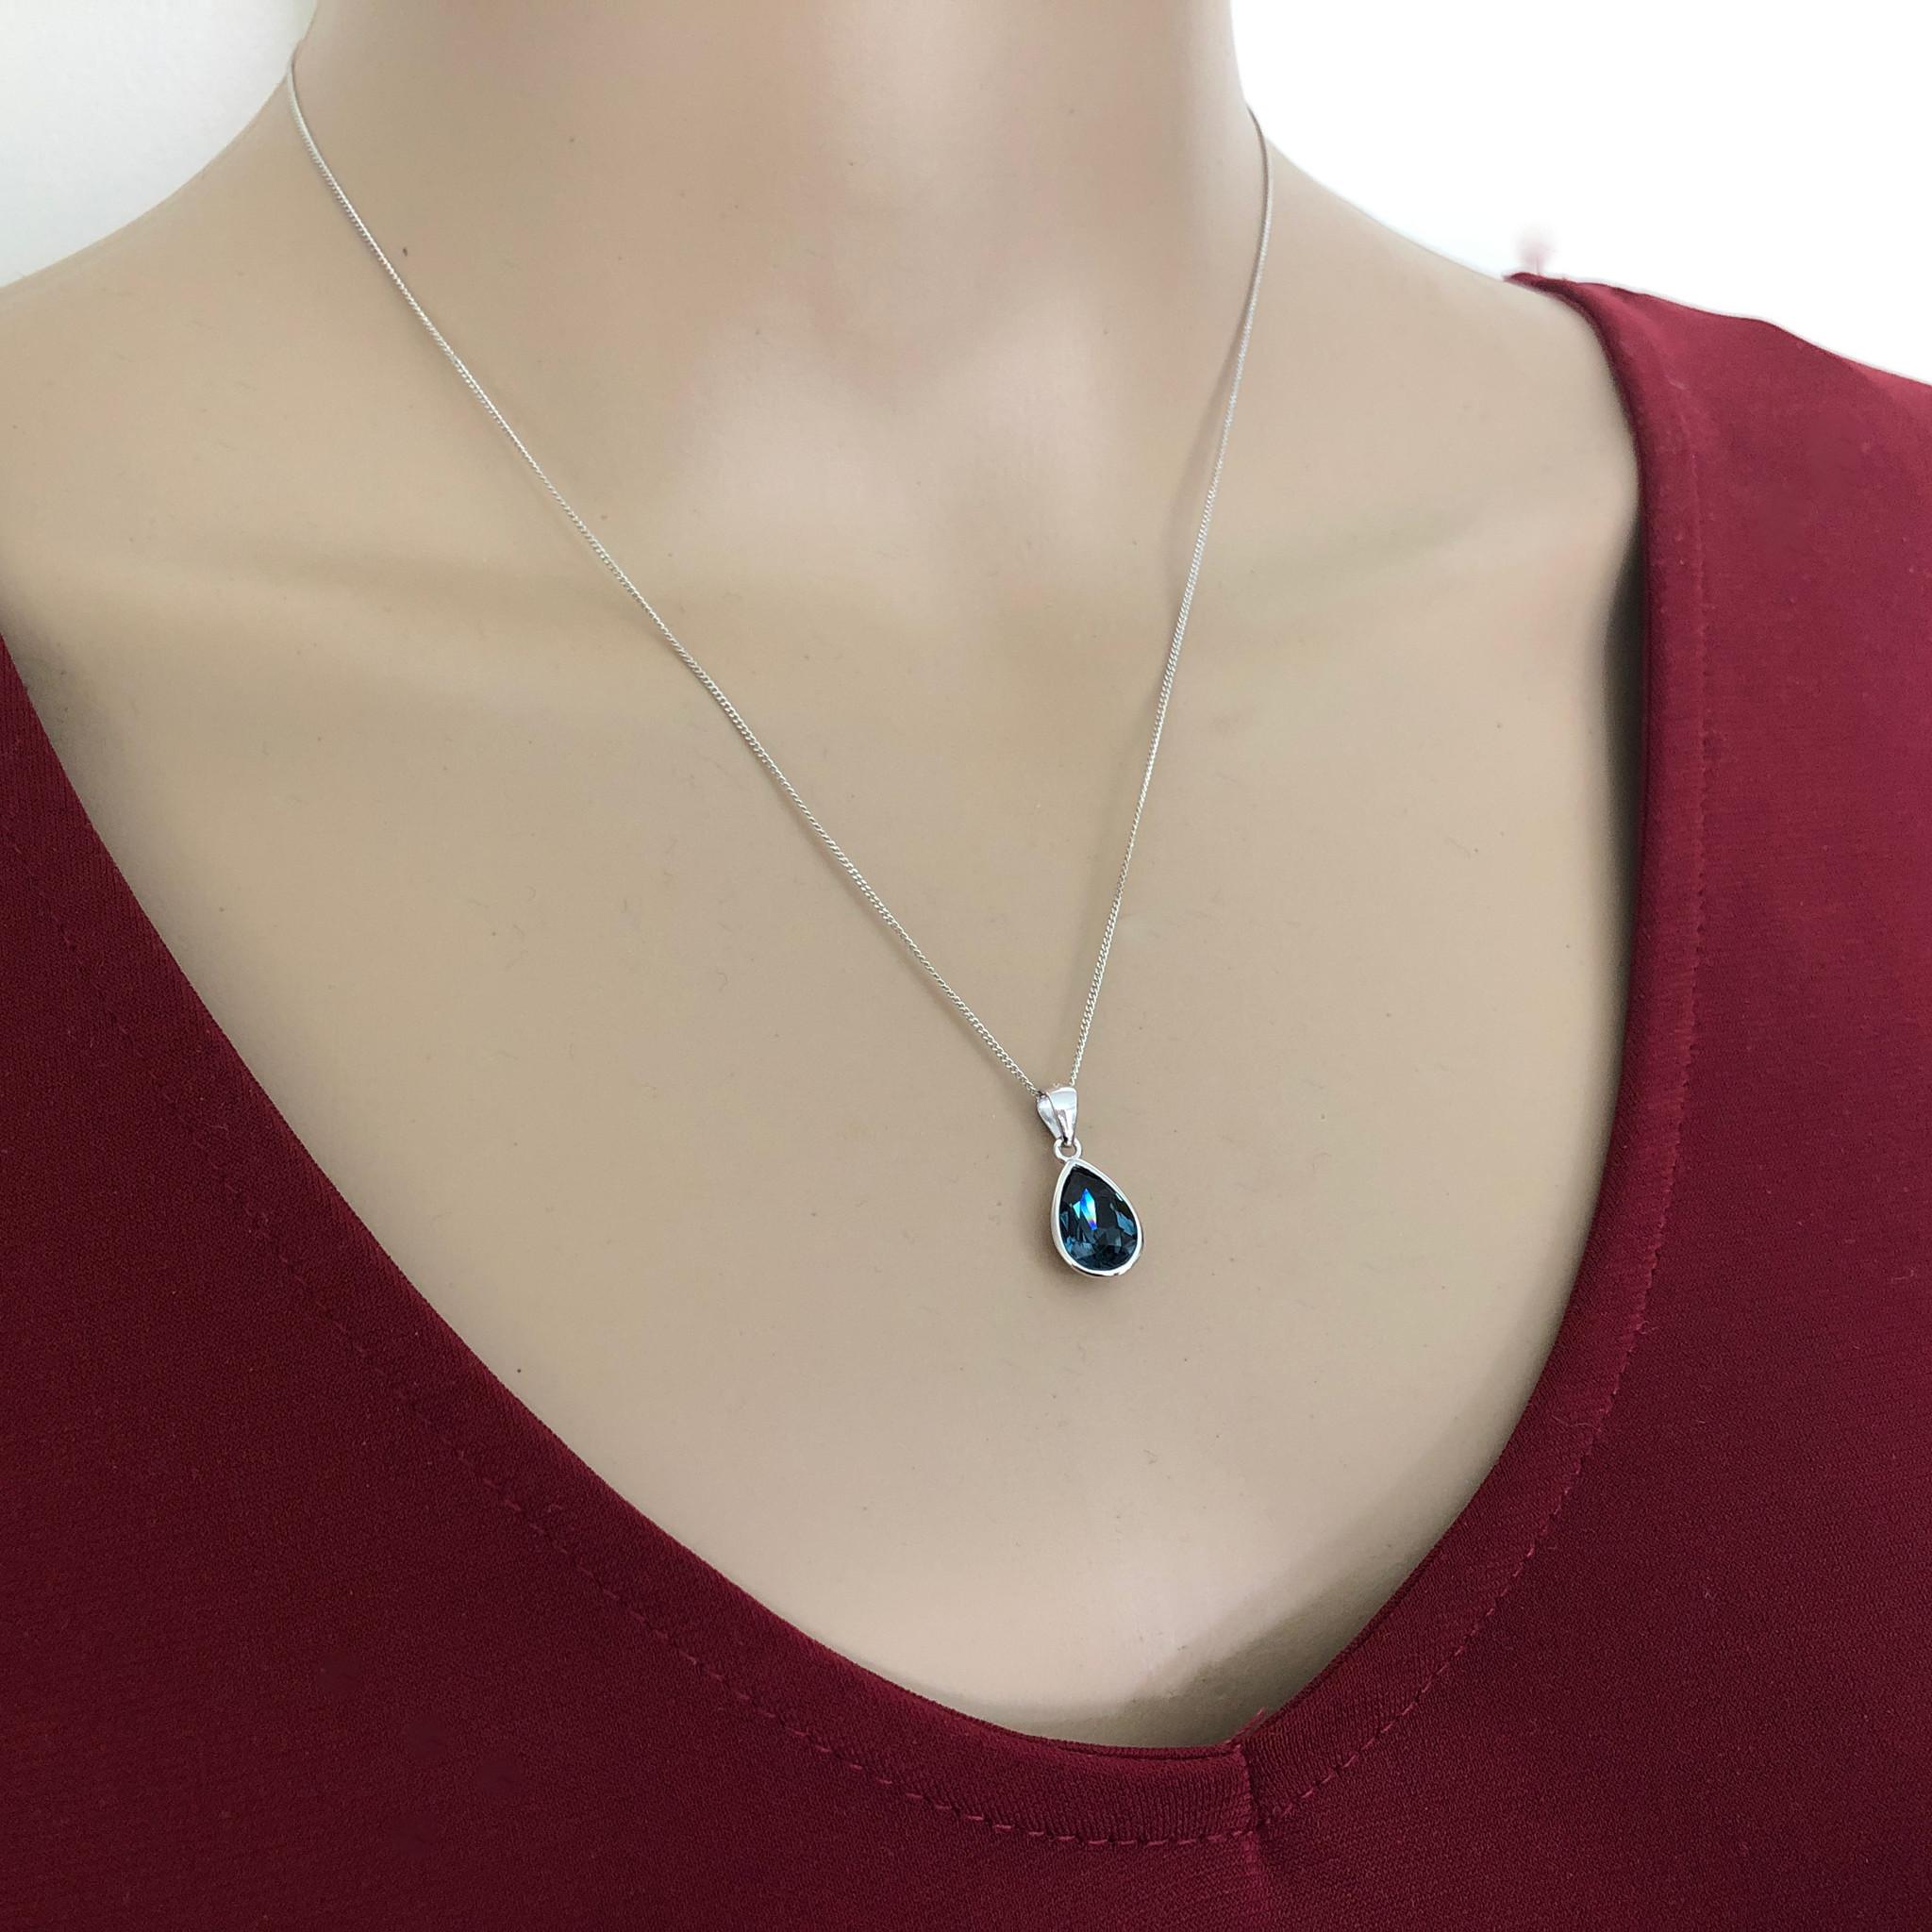 Zilveren Swarovski montana blauw crystal druppel ketting-2